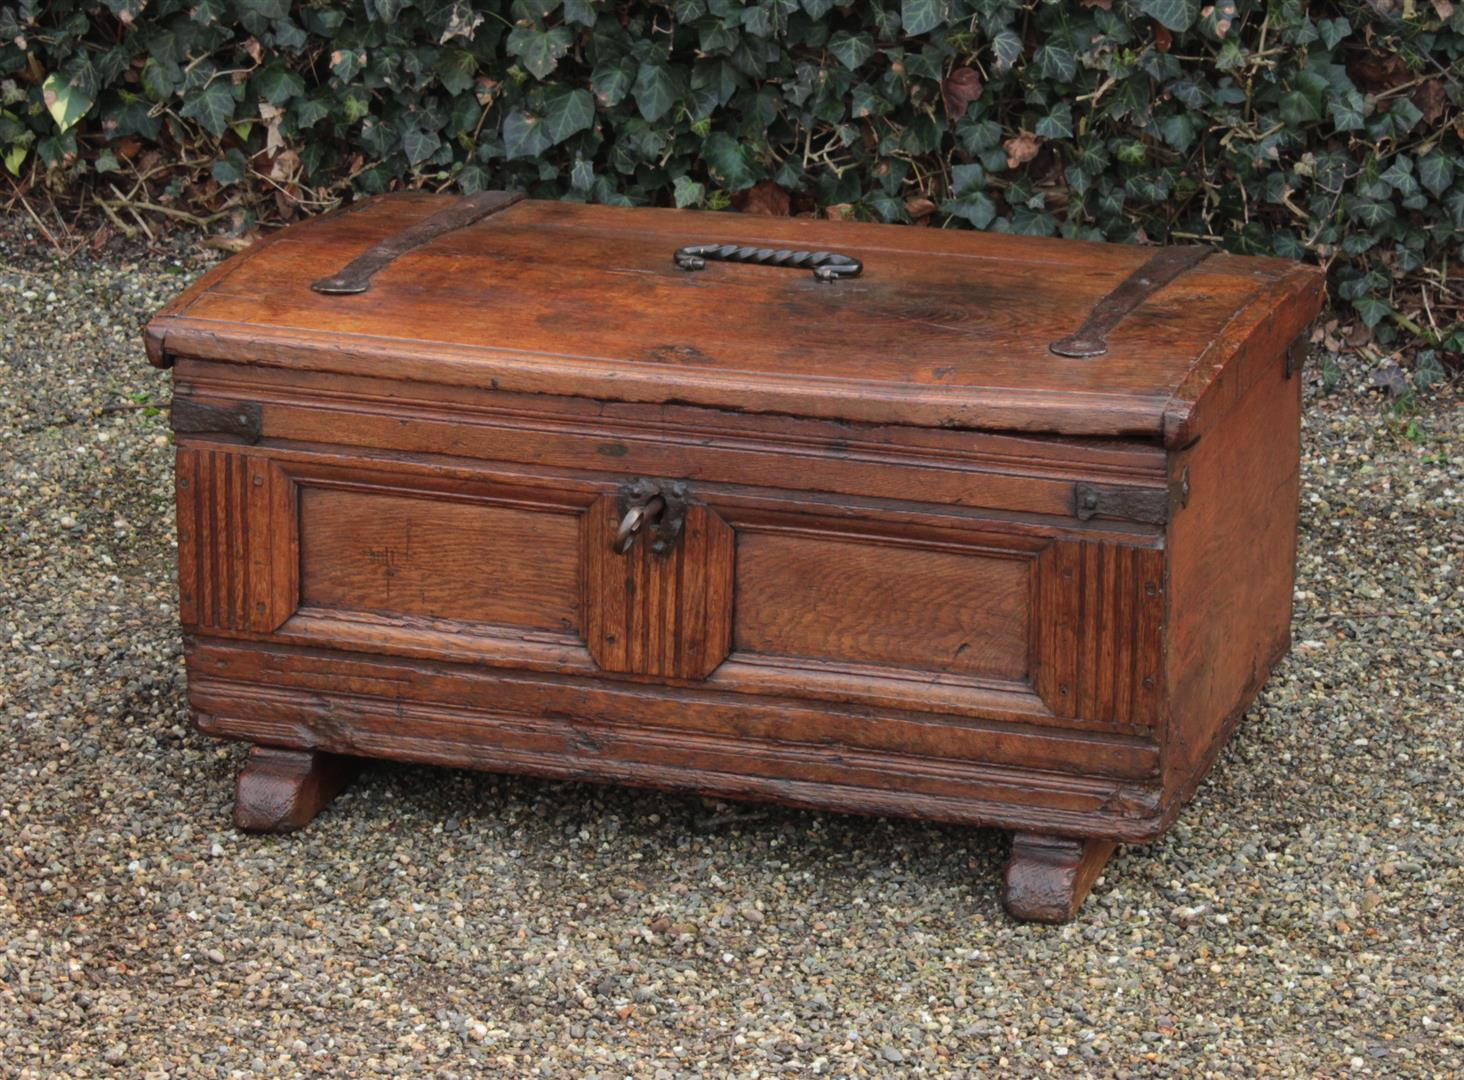 spezialisiert im antike m bel antik m bel antike m beln. Black Bedroom Furniture Sets. Home Design Ideas